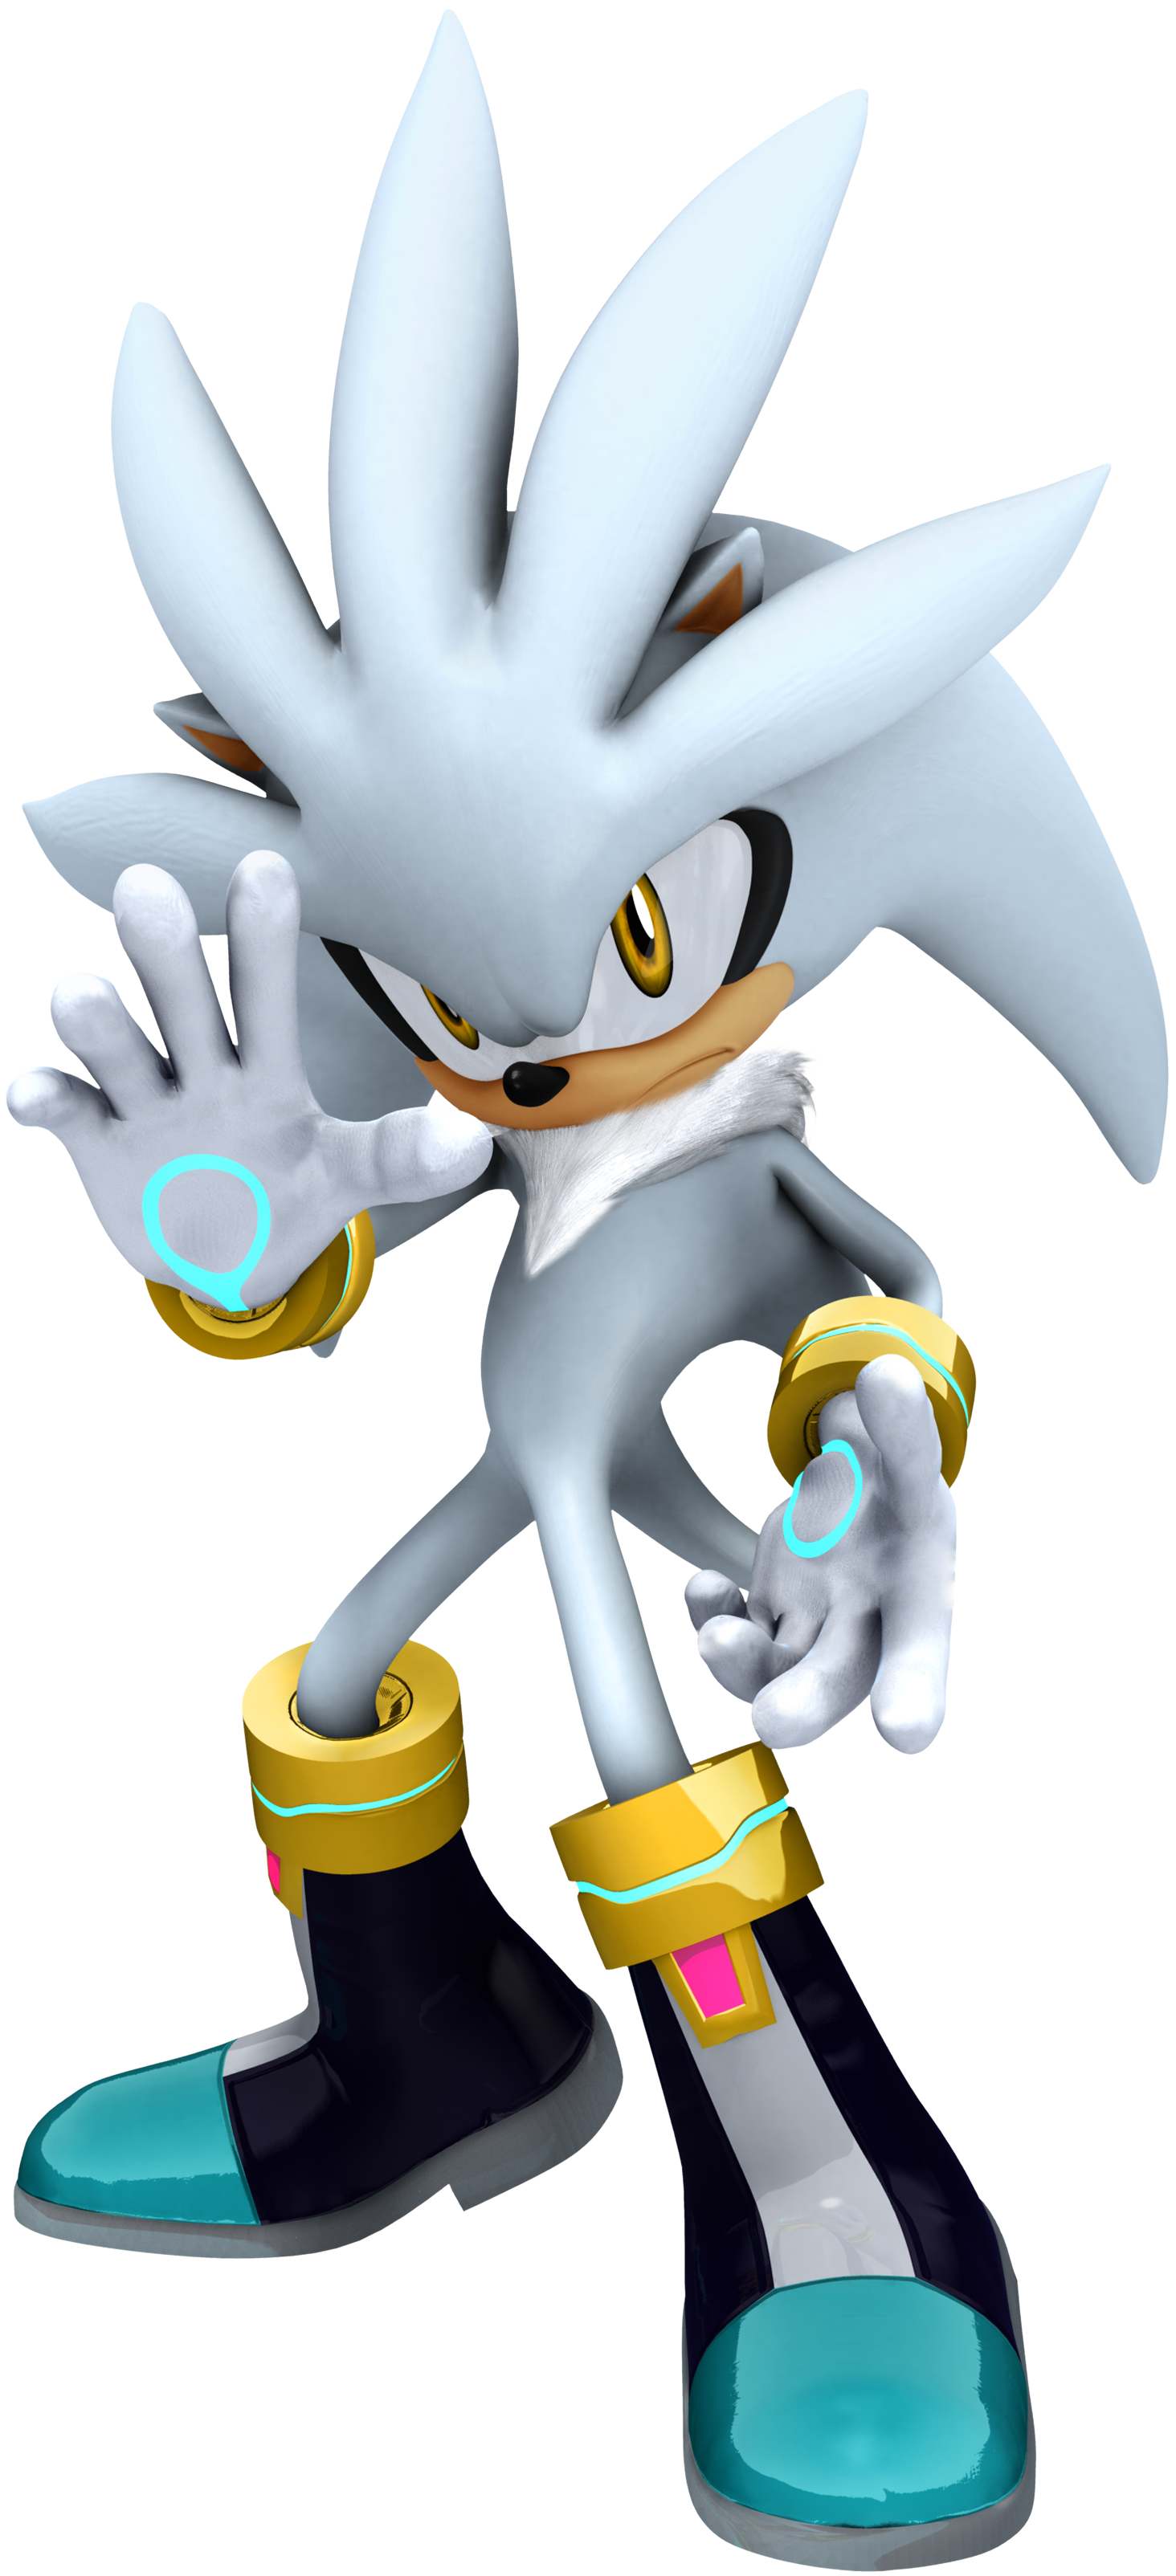 external image Sonic_the_Hedgehog_(2006).png